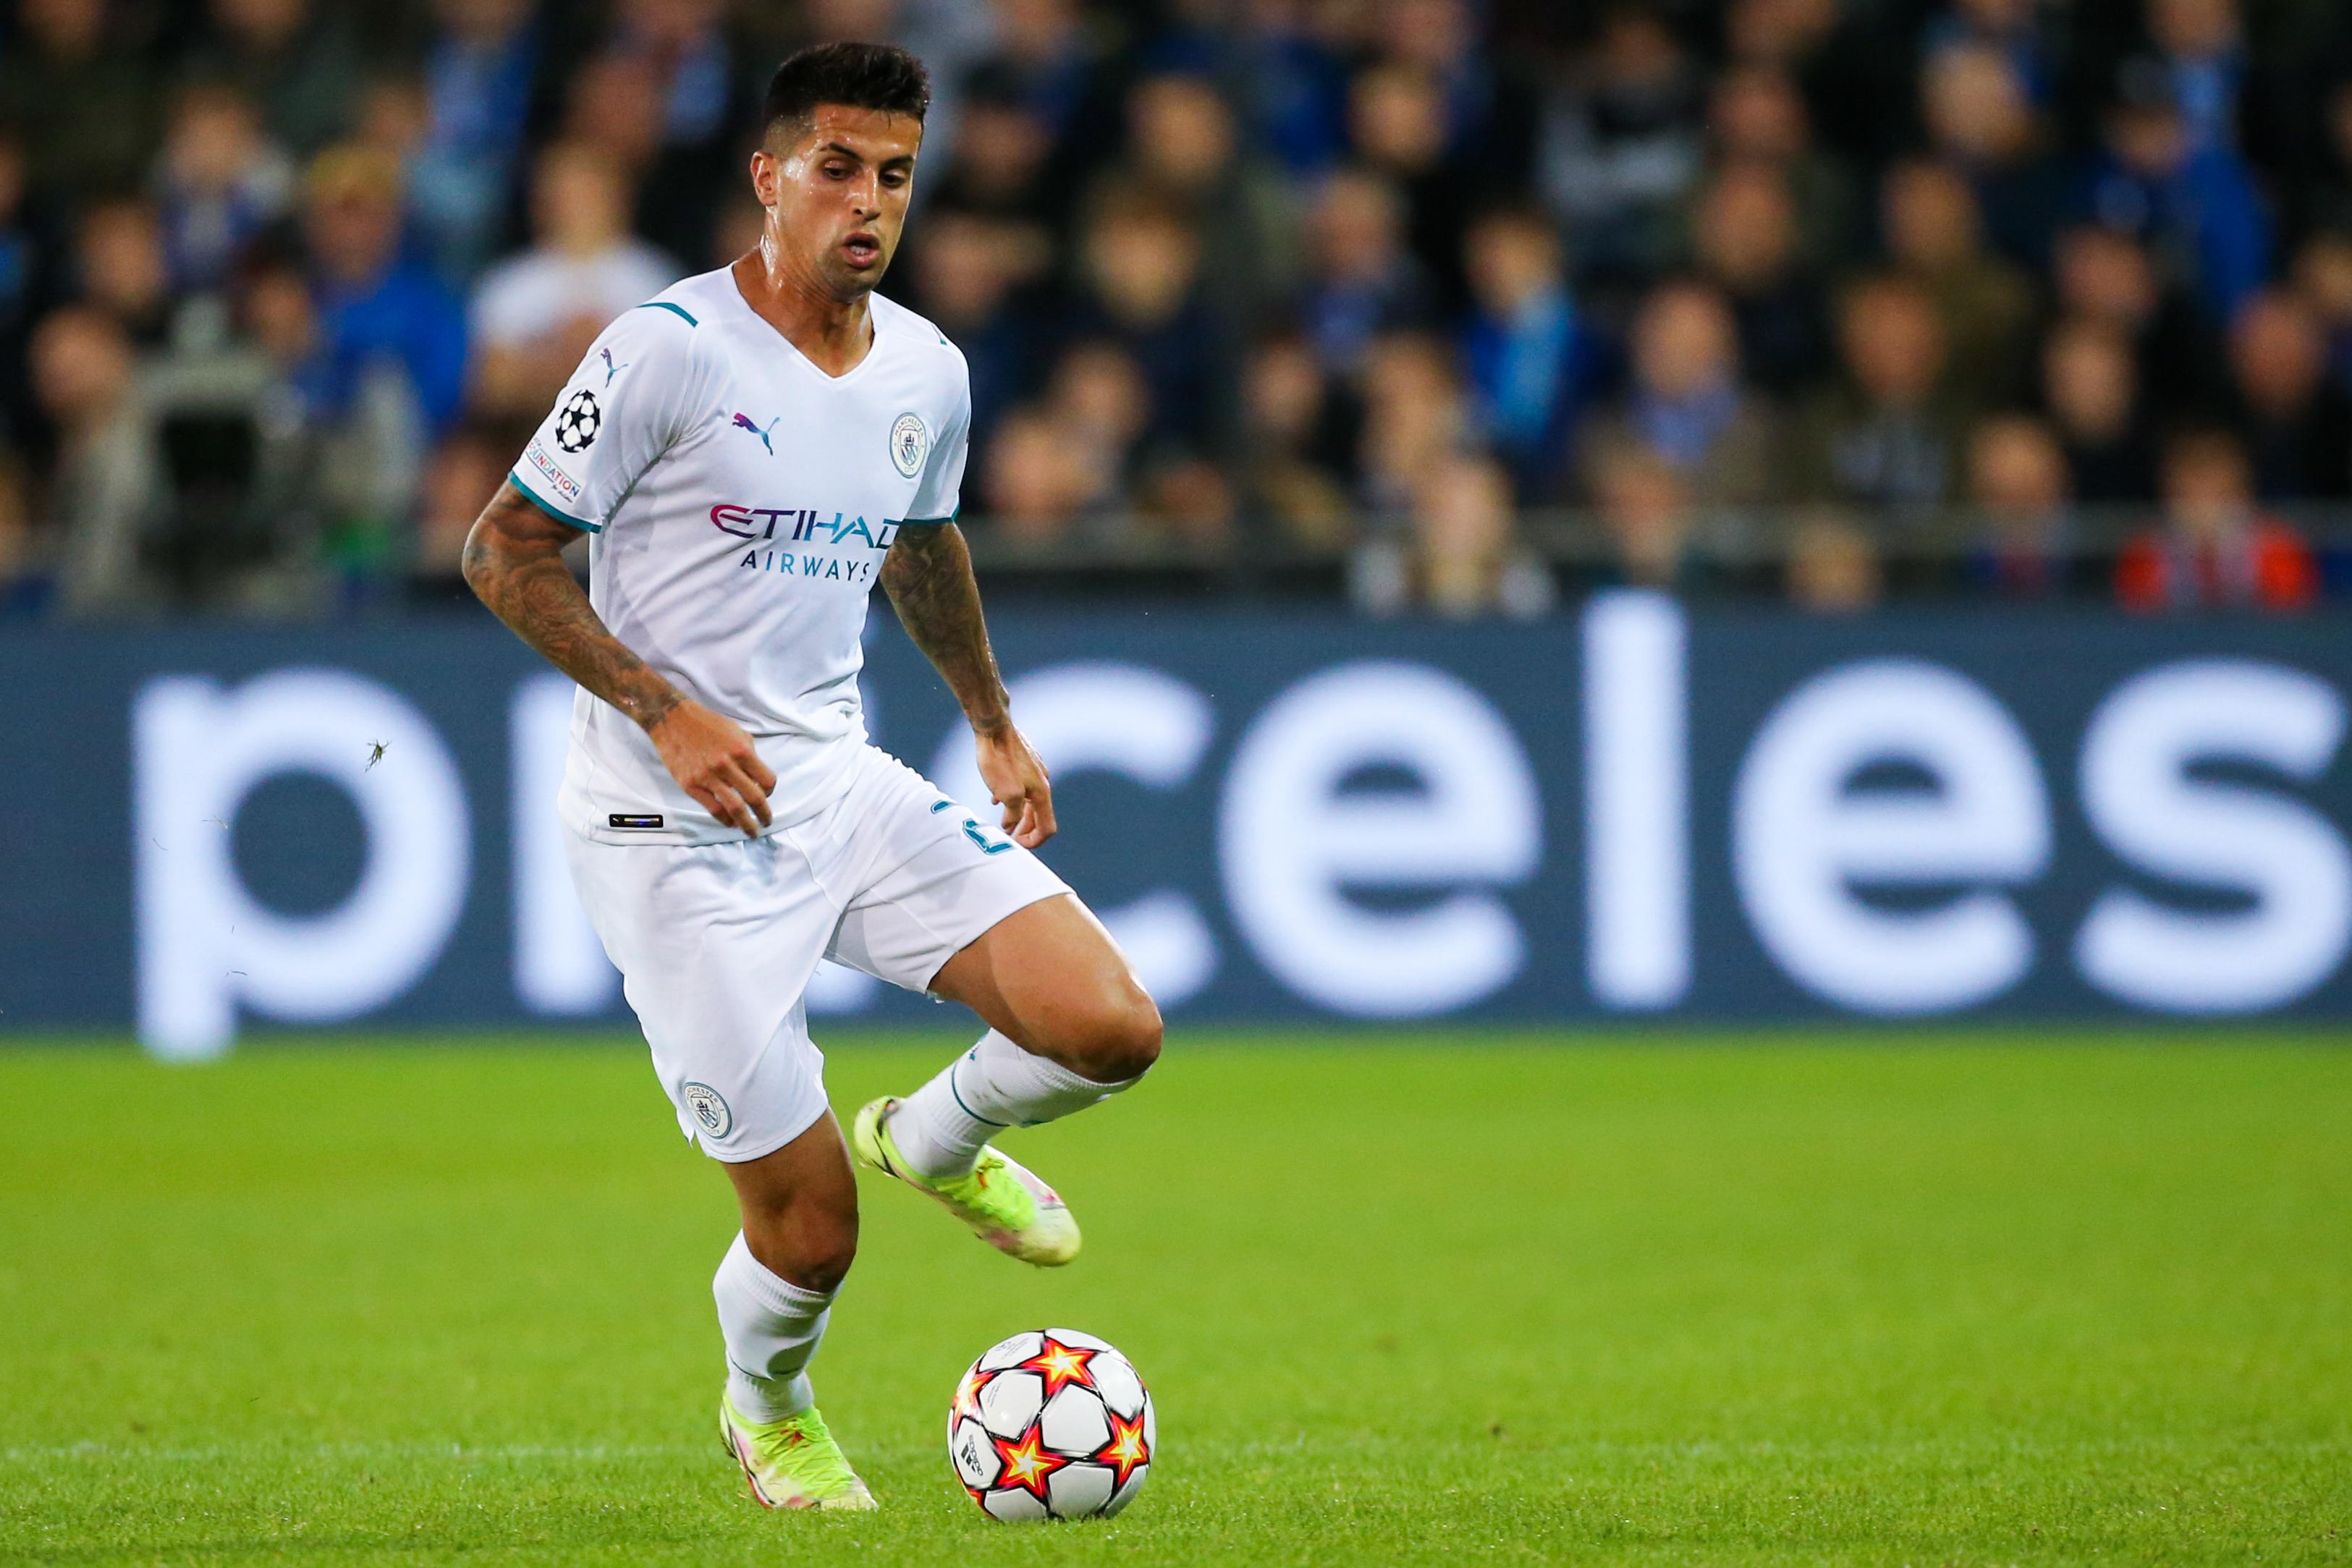 Club Brugge KV v Manchester City - Group A - UEFA Champions League